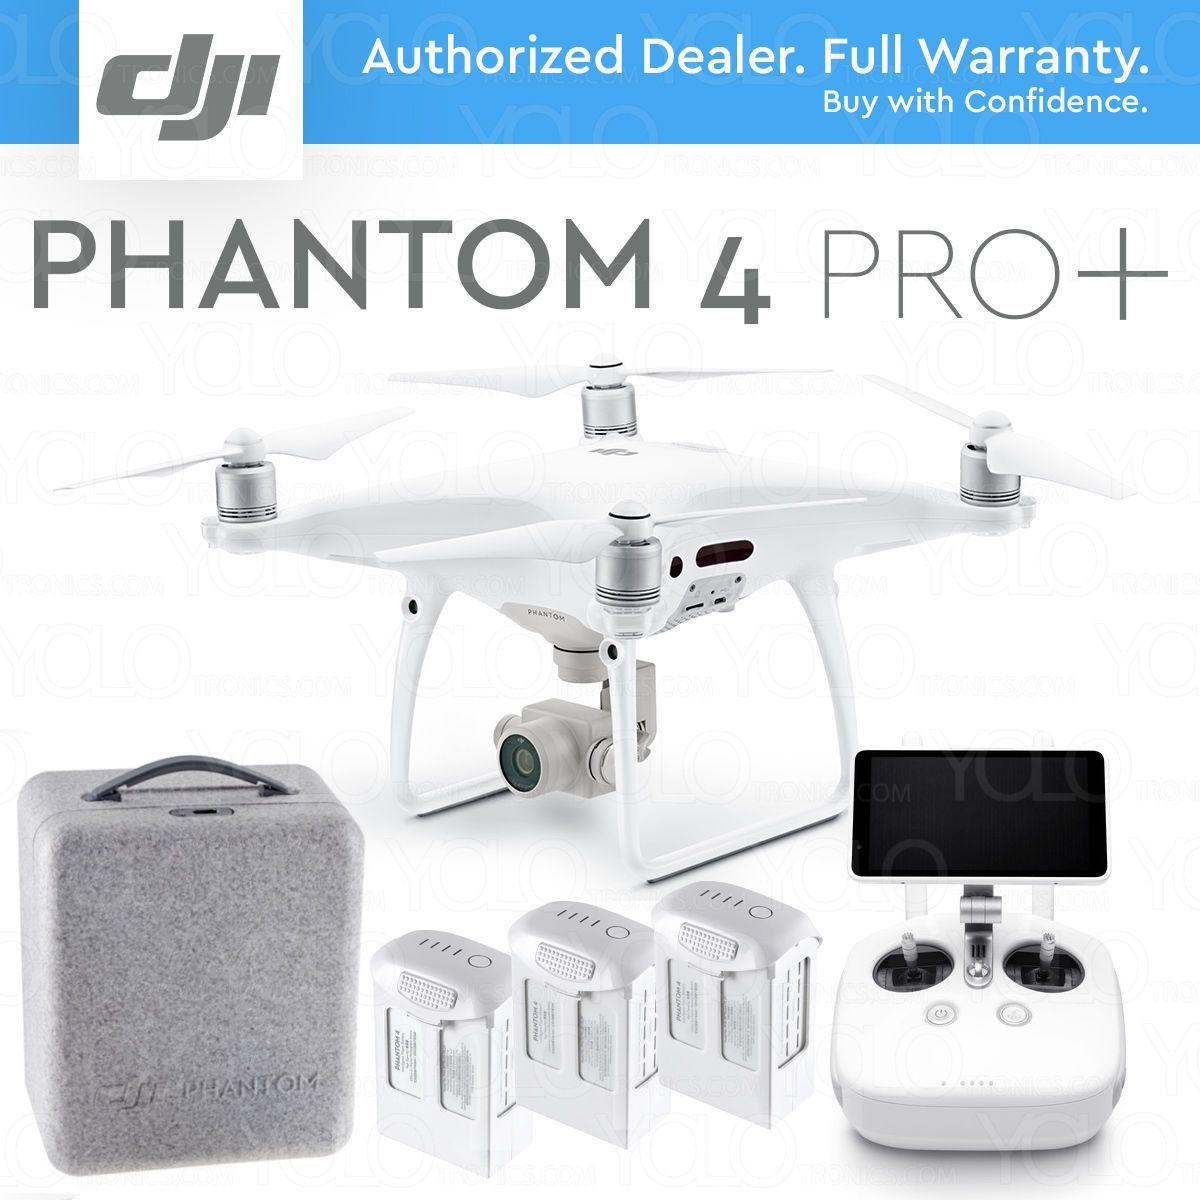 Dji Phantom 4 Pro Plus Drone W Gimbal Camera 1 Cmos 4k 20mp 5 5 Display Drone Camera Dji Cmos Sensor